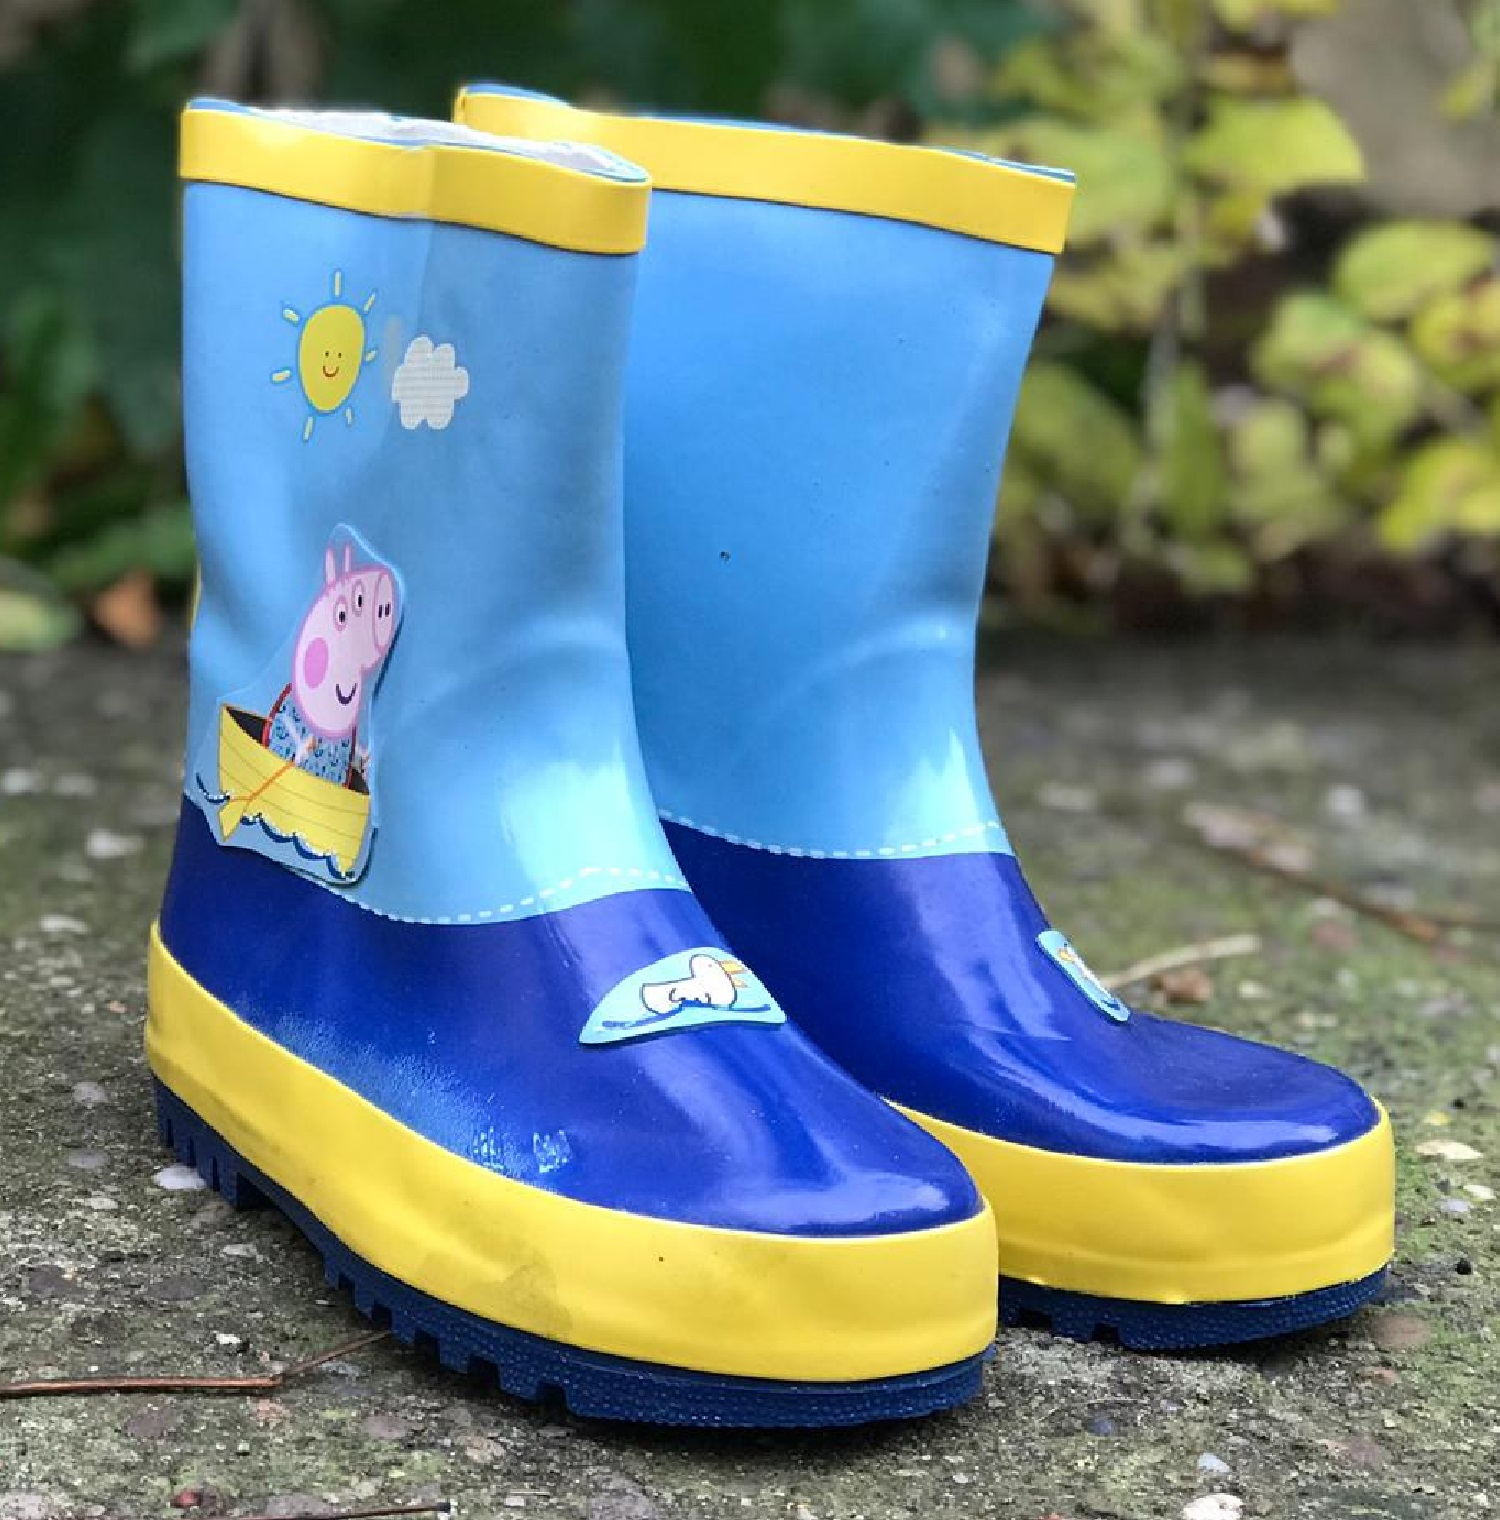 KIDS BOYS GIRLS INFANTS WATERPROOF RAIN WELLIES MCKER WELLINGTONS SPLASH BOOTS